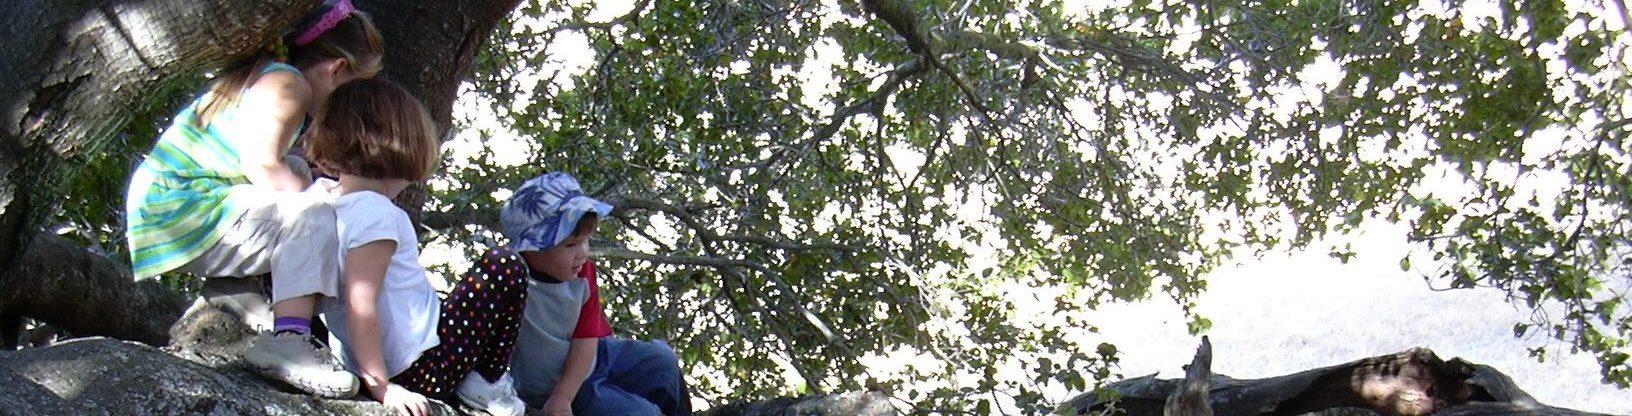 Hummingbird Hill Playgarden